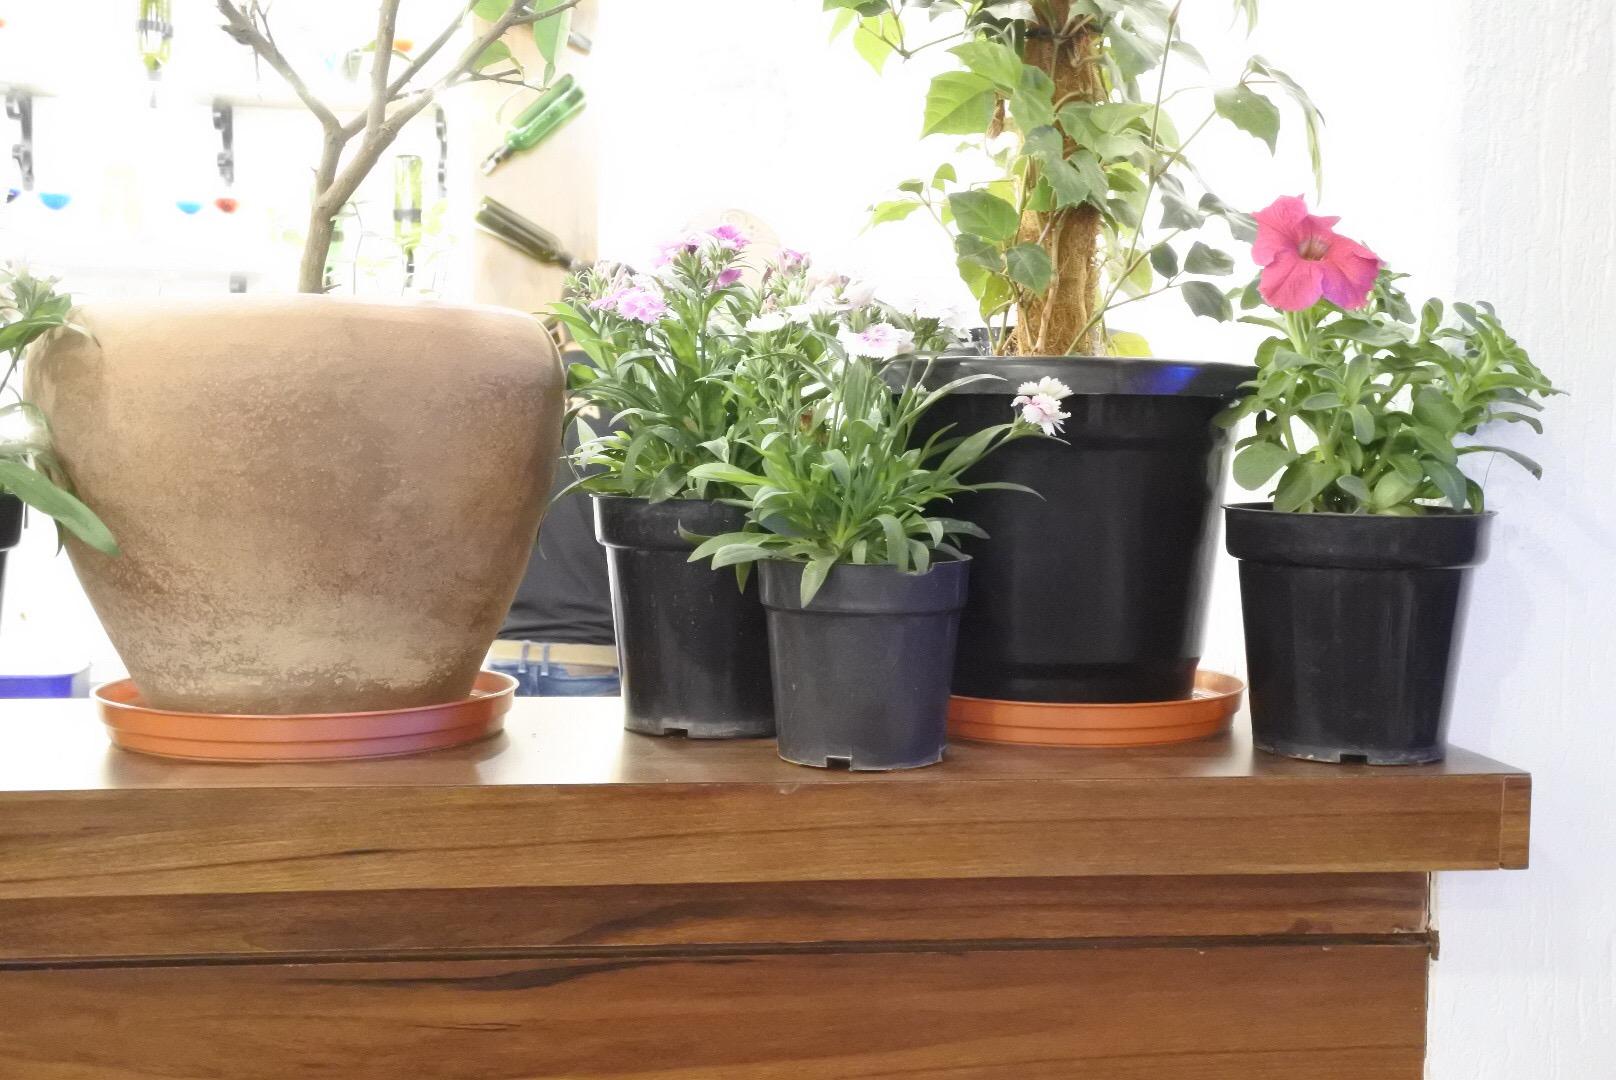 Pretty flower pots everywhere